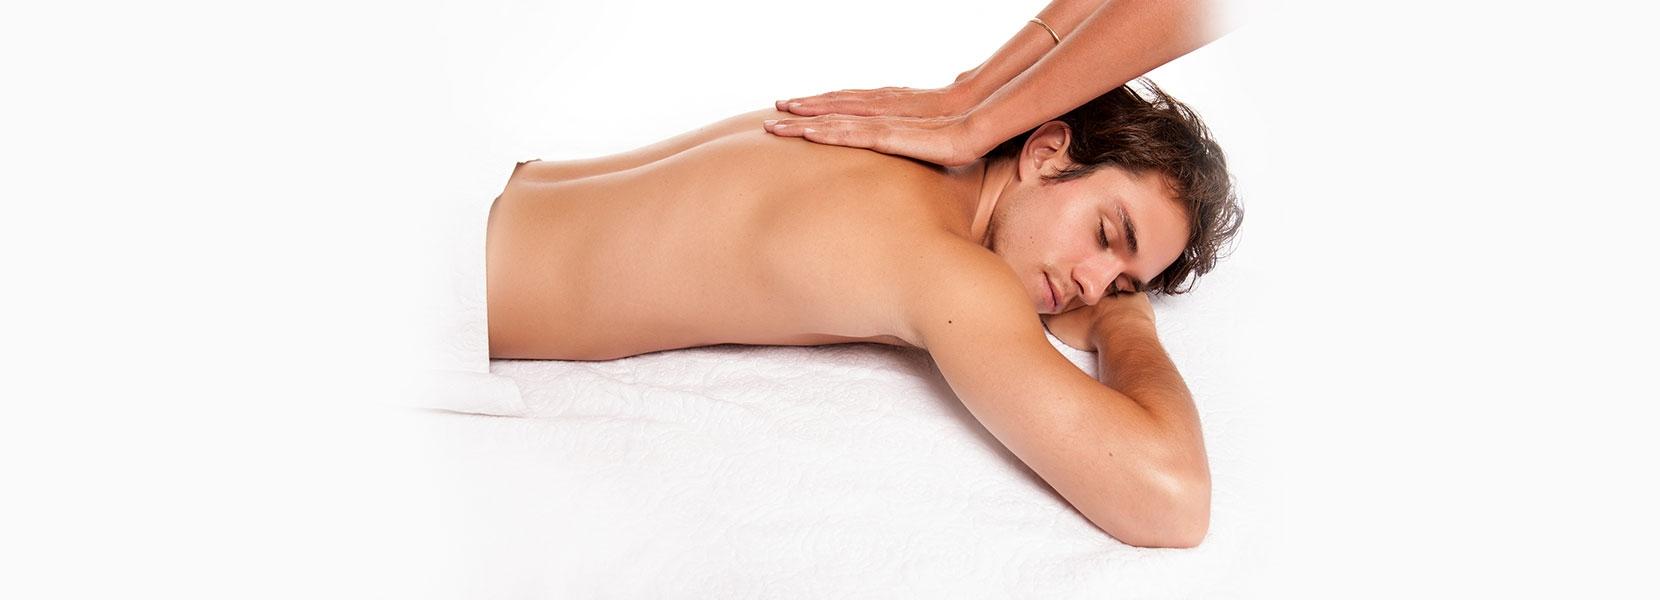 Nuru Tantric Massage London (@nurutantricmassage) Cover Image